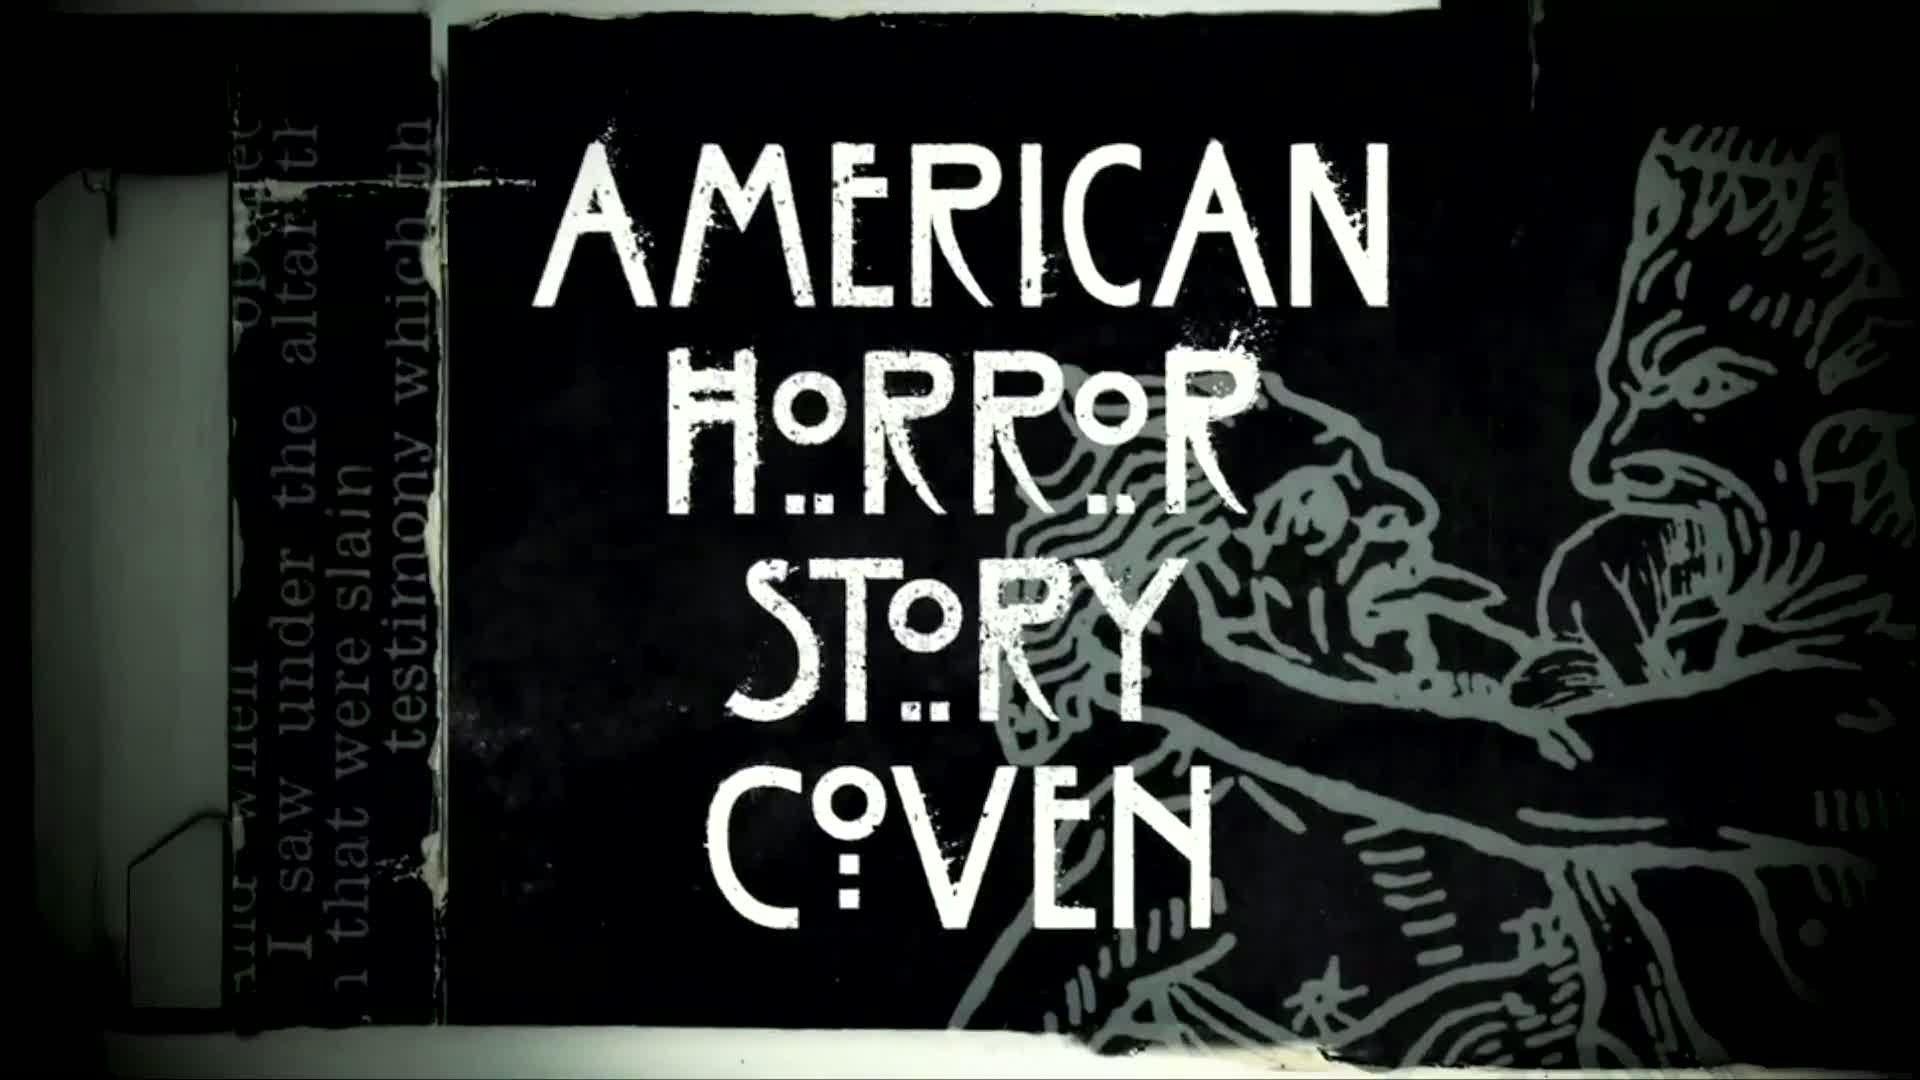 American horror story coven wallpapers hd for desktop - Ahs wallpaper ...